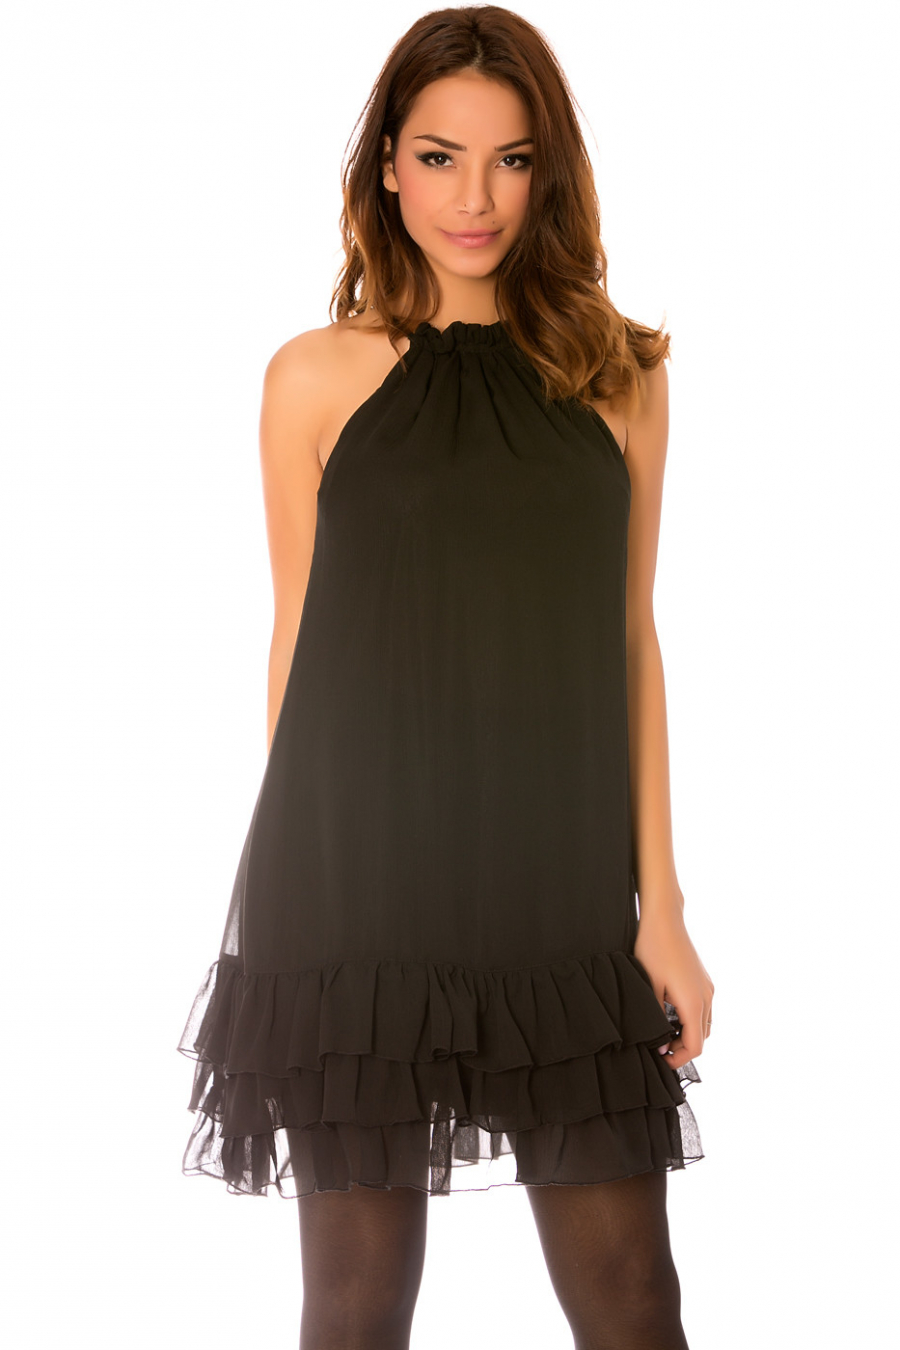 Zwarte mouwloze jurk, dunne bandjes met golvende onderkant en voering. 925